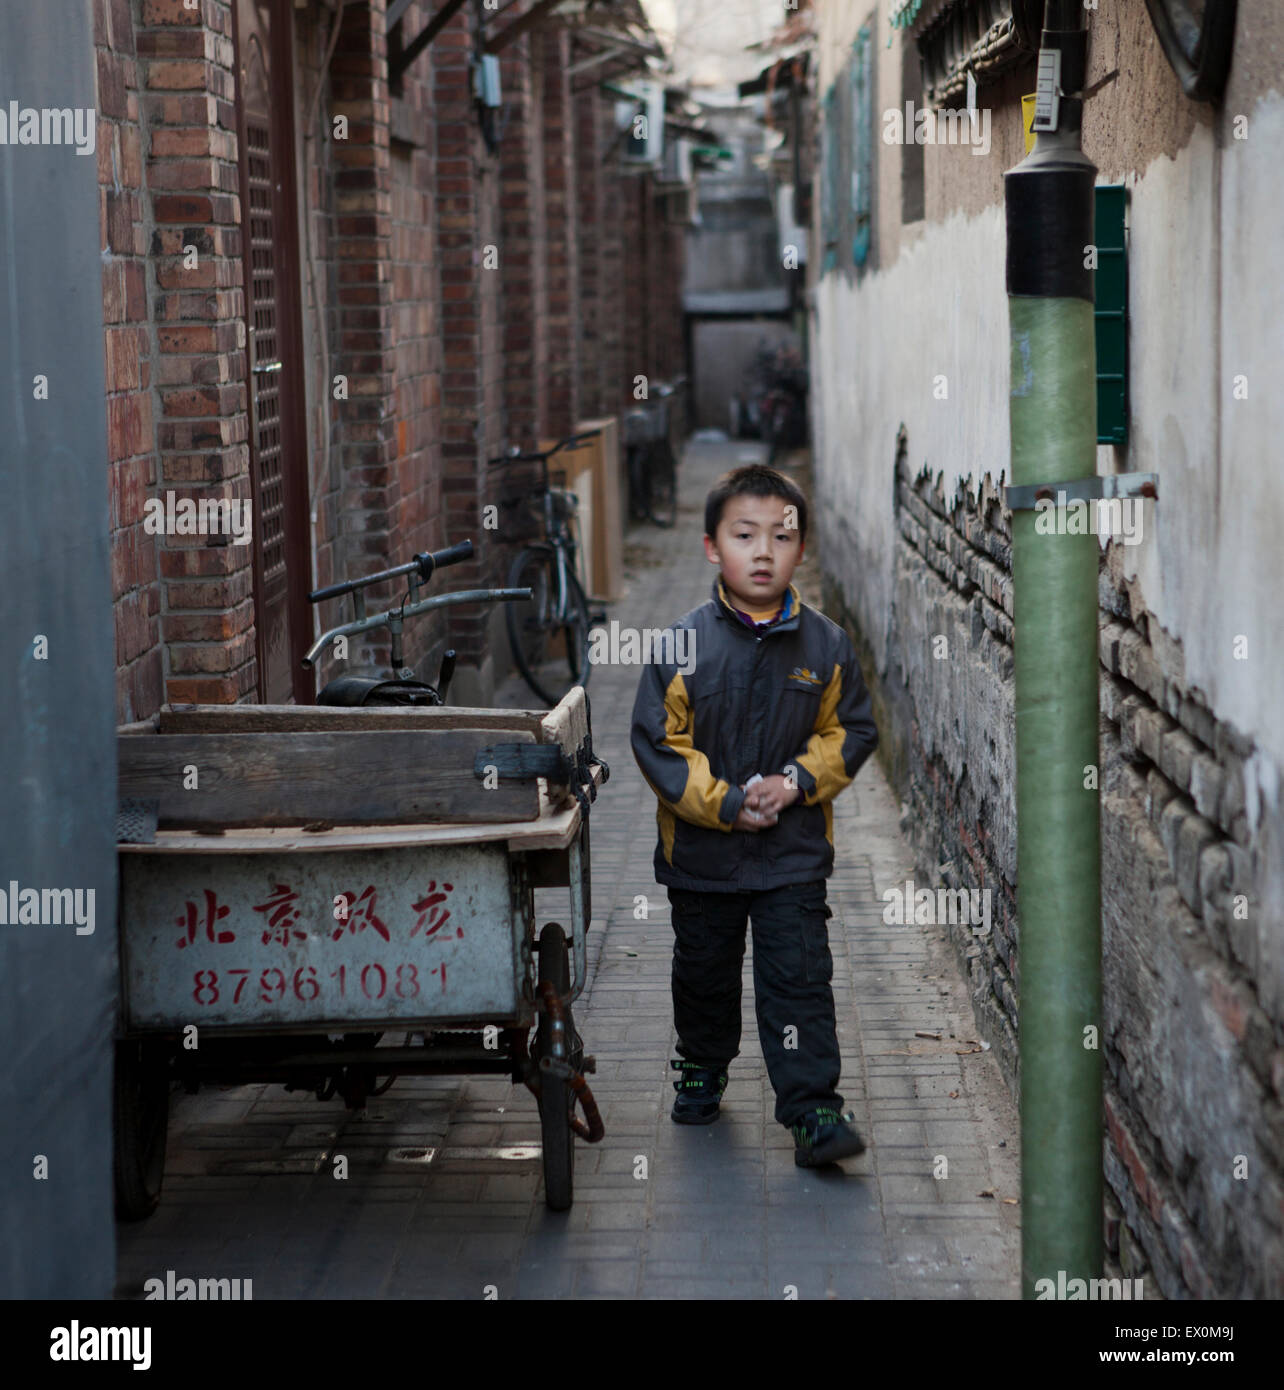 Boy in Hutong, Beijing, China - Stock Image